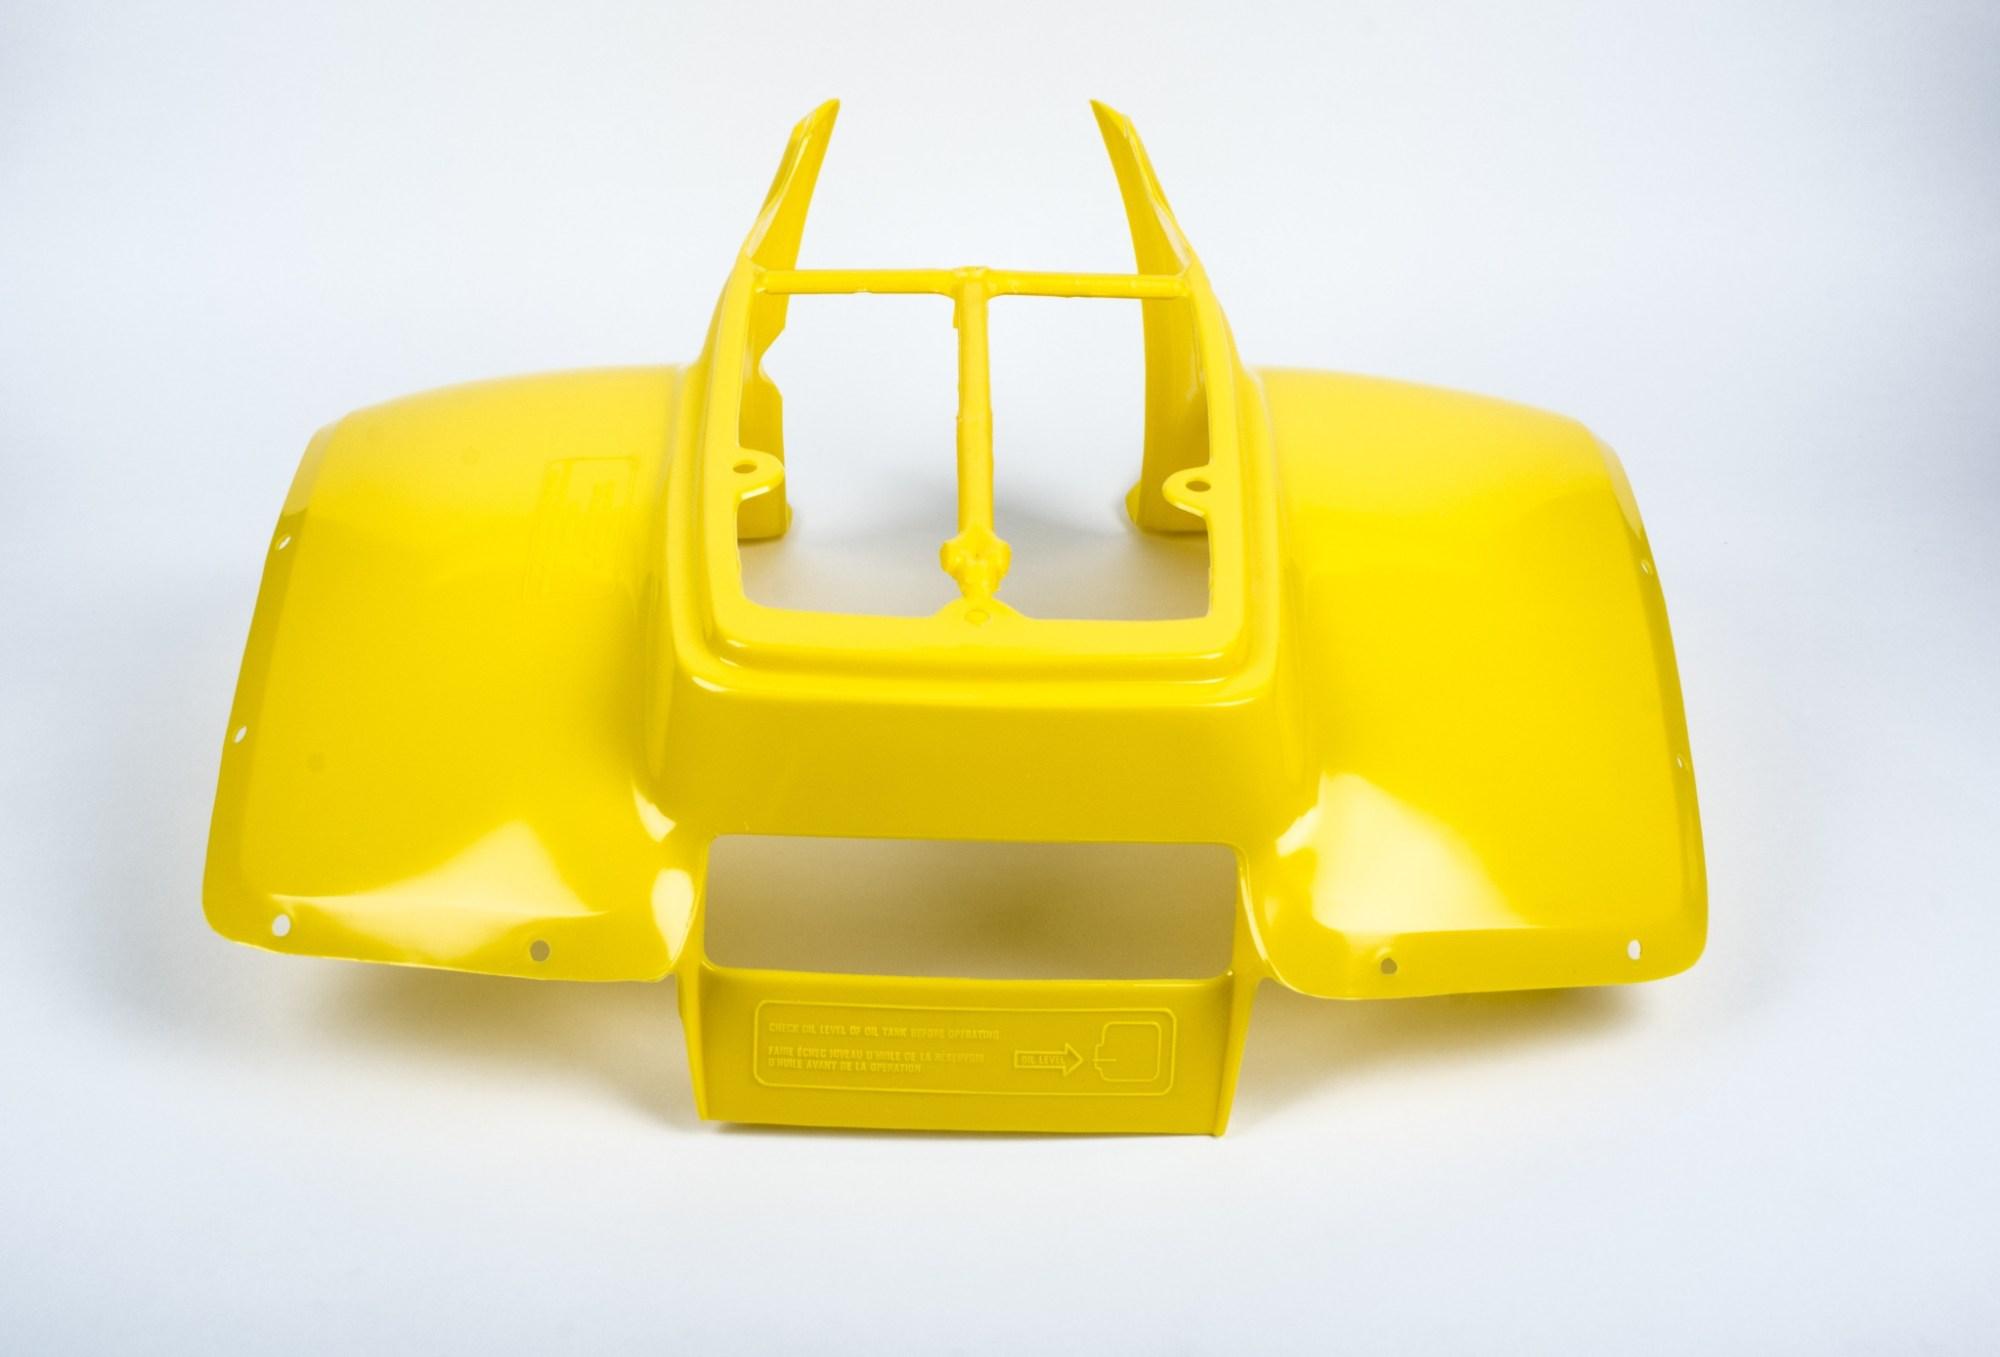 hight resolution of sentinel genuine suzuki lt50 model x y atv rear fender rear fender 63111 04600